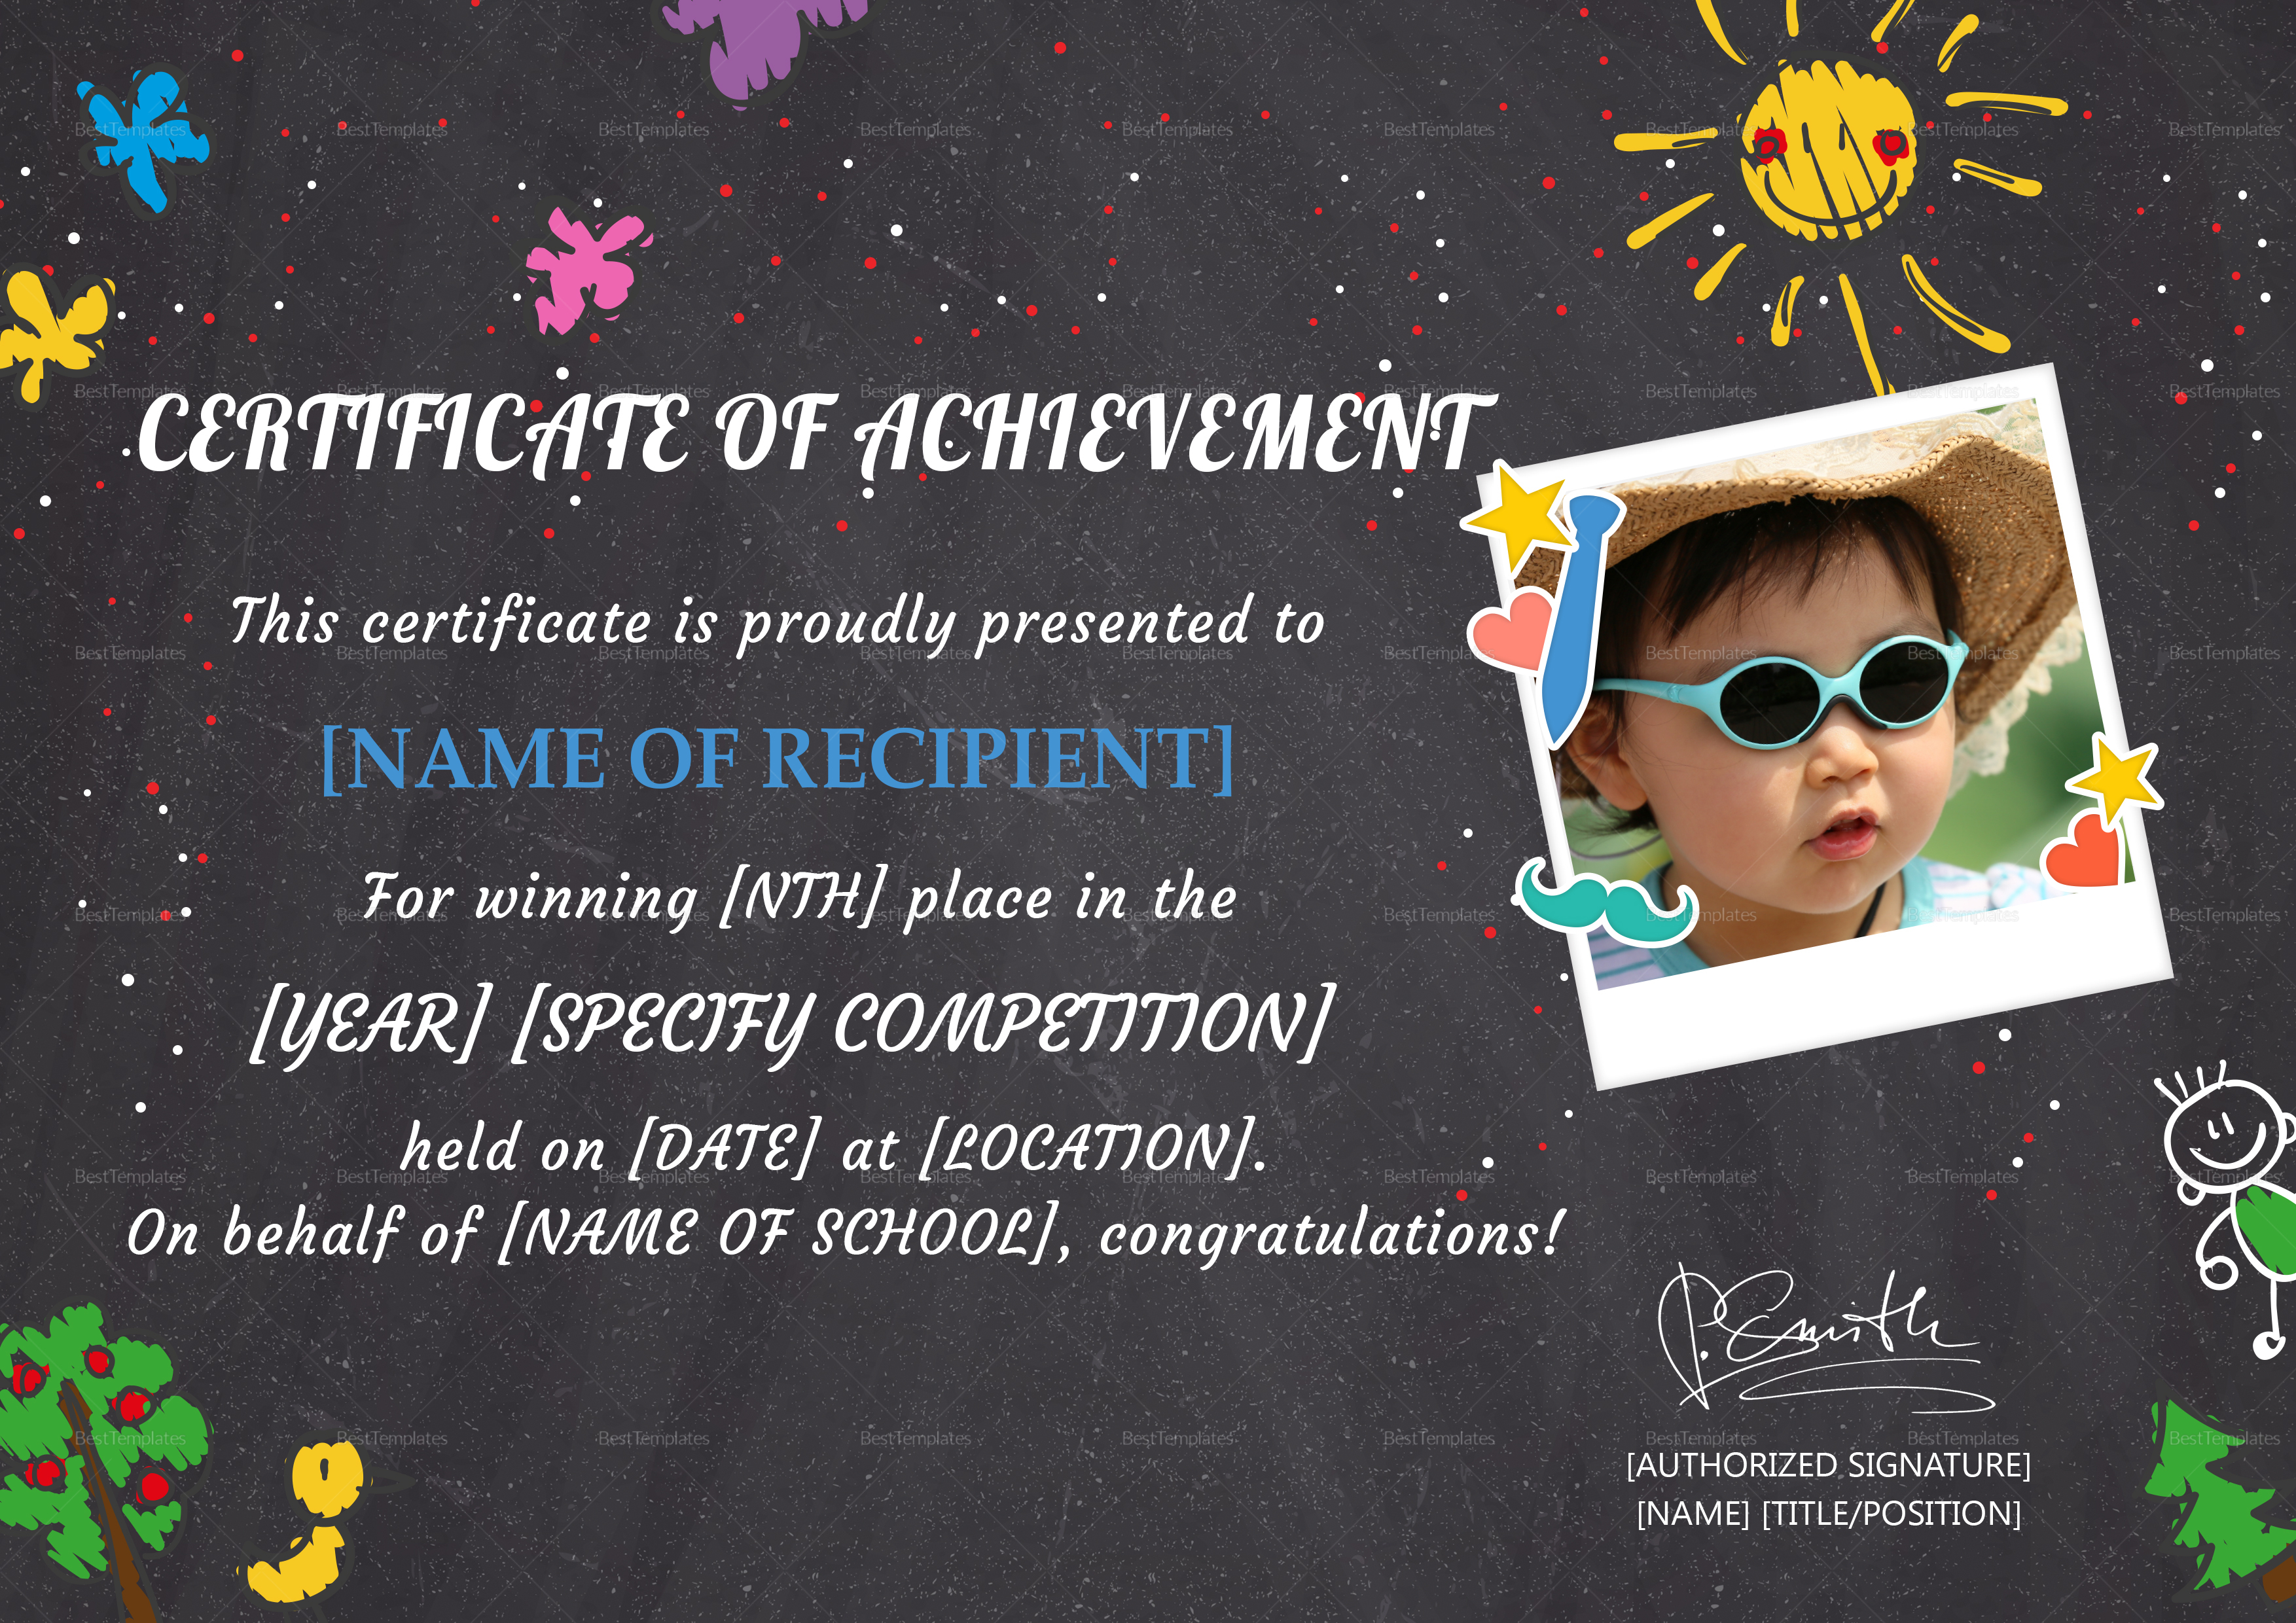 School Certificate of Achievement